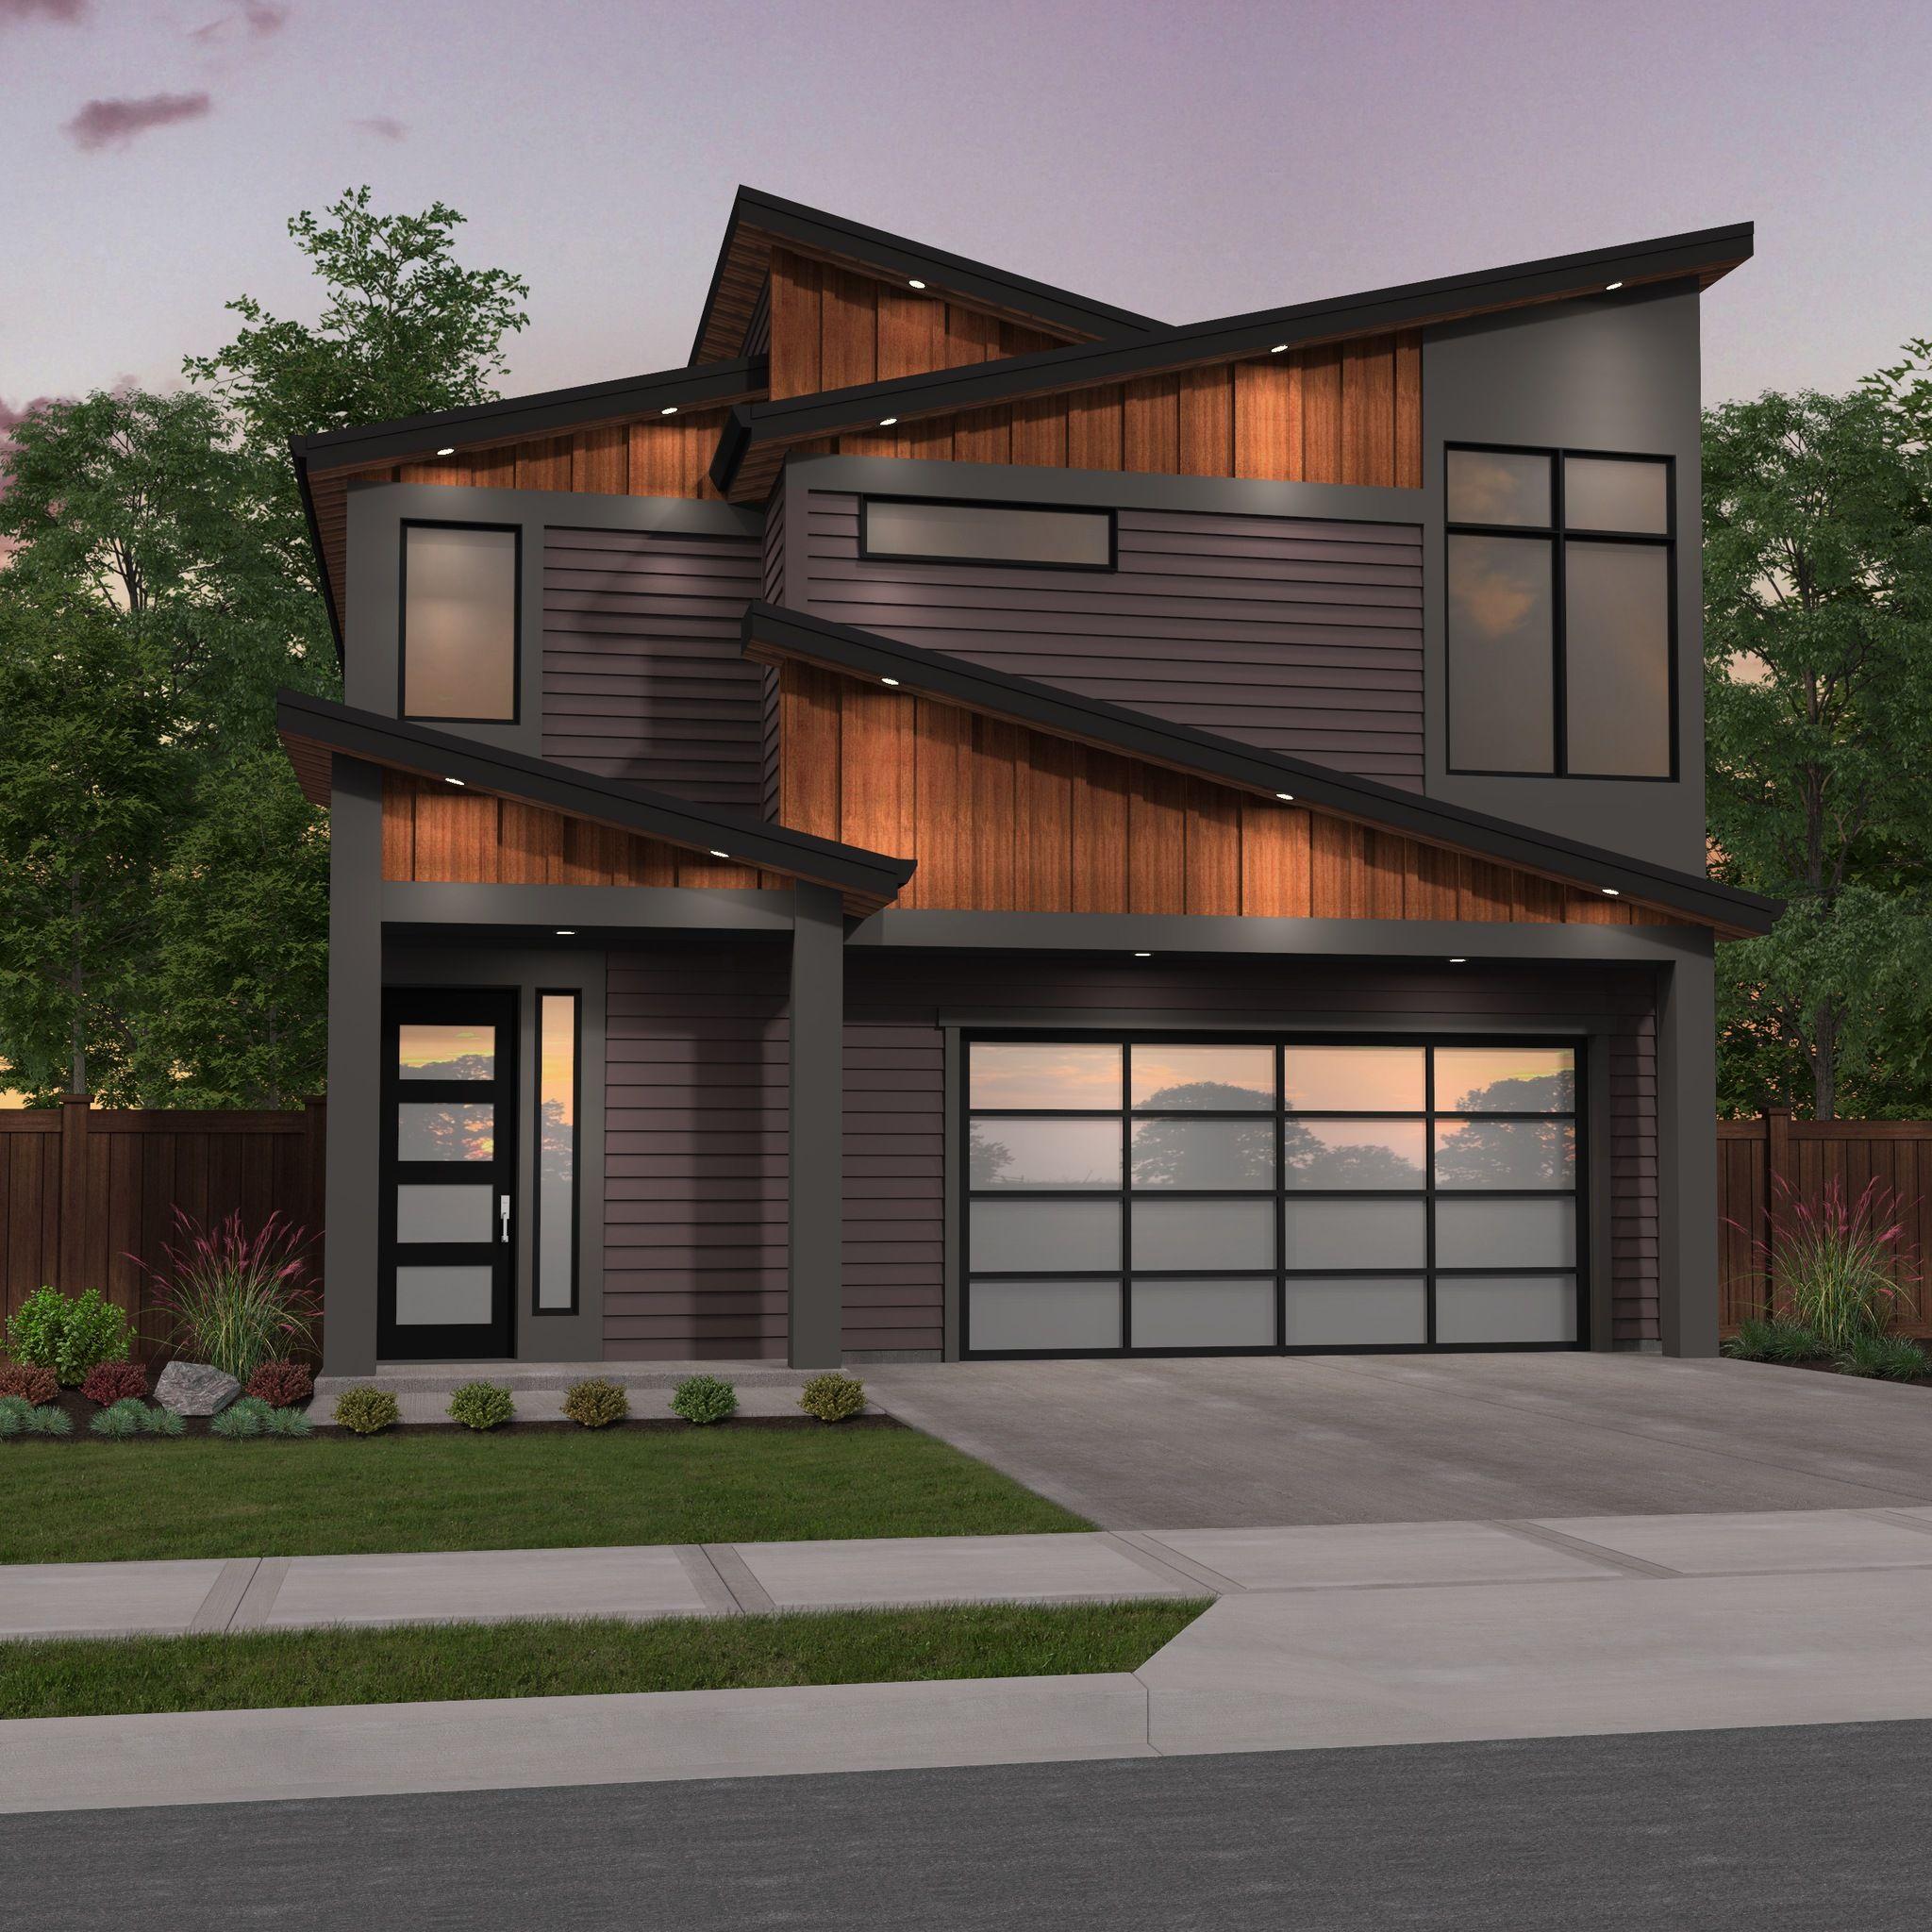 Good Edge Mark Stewart Home Design Shed Roof Design Modern House Plans House Designs Exterior